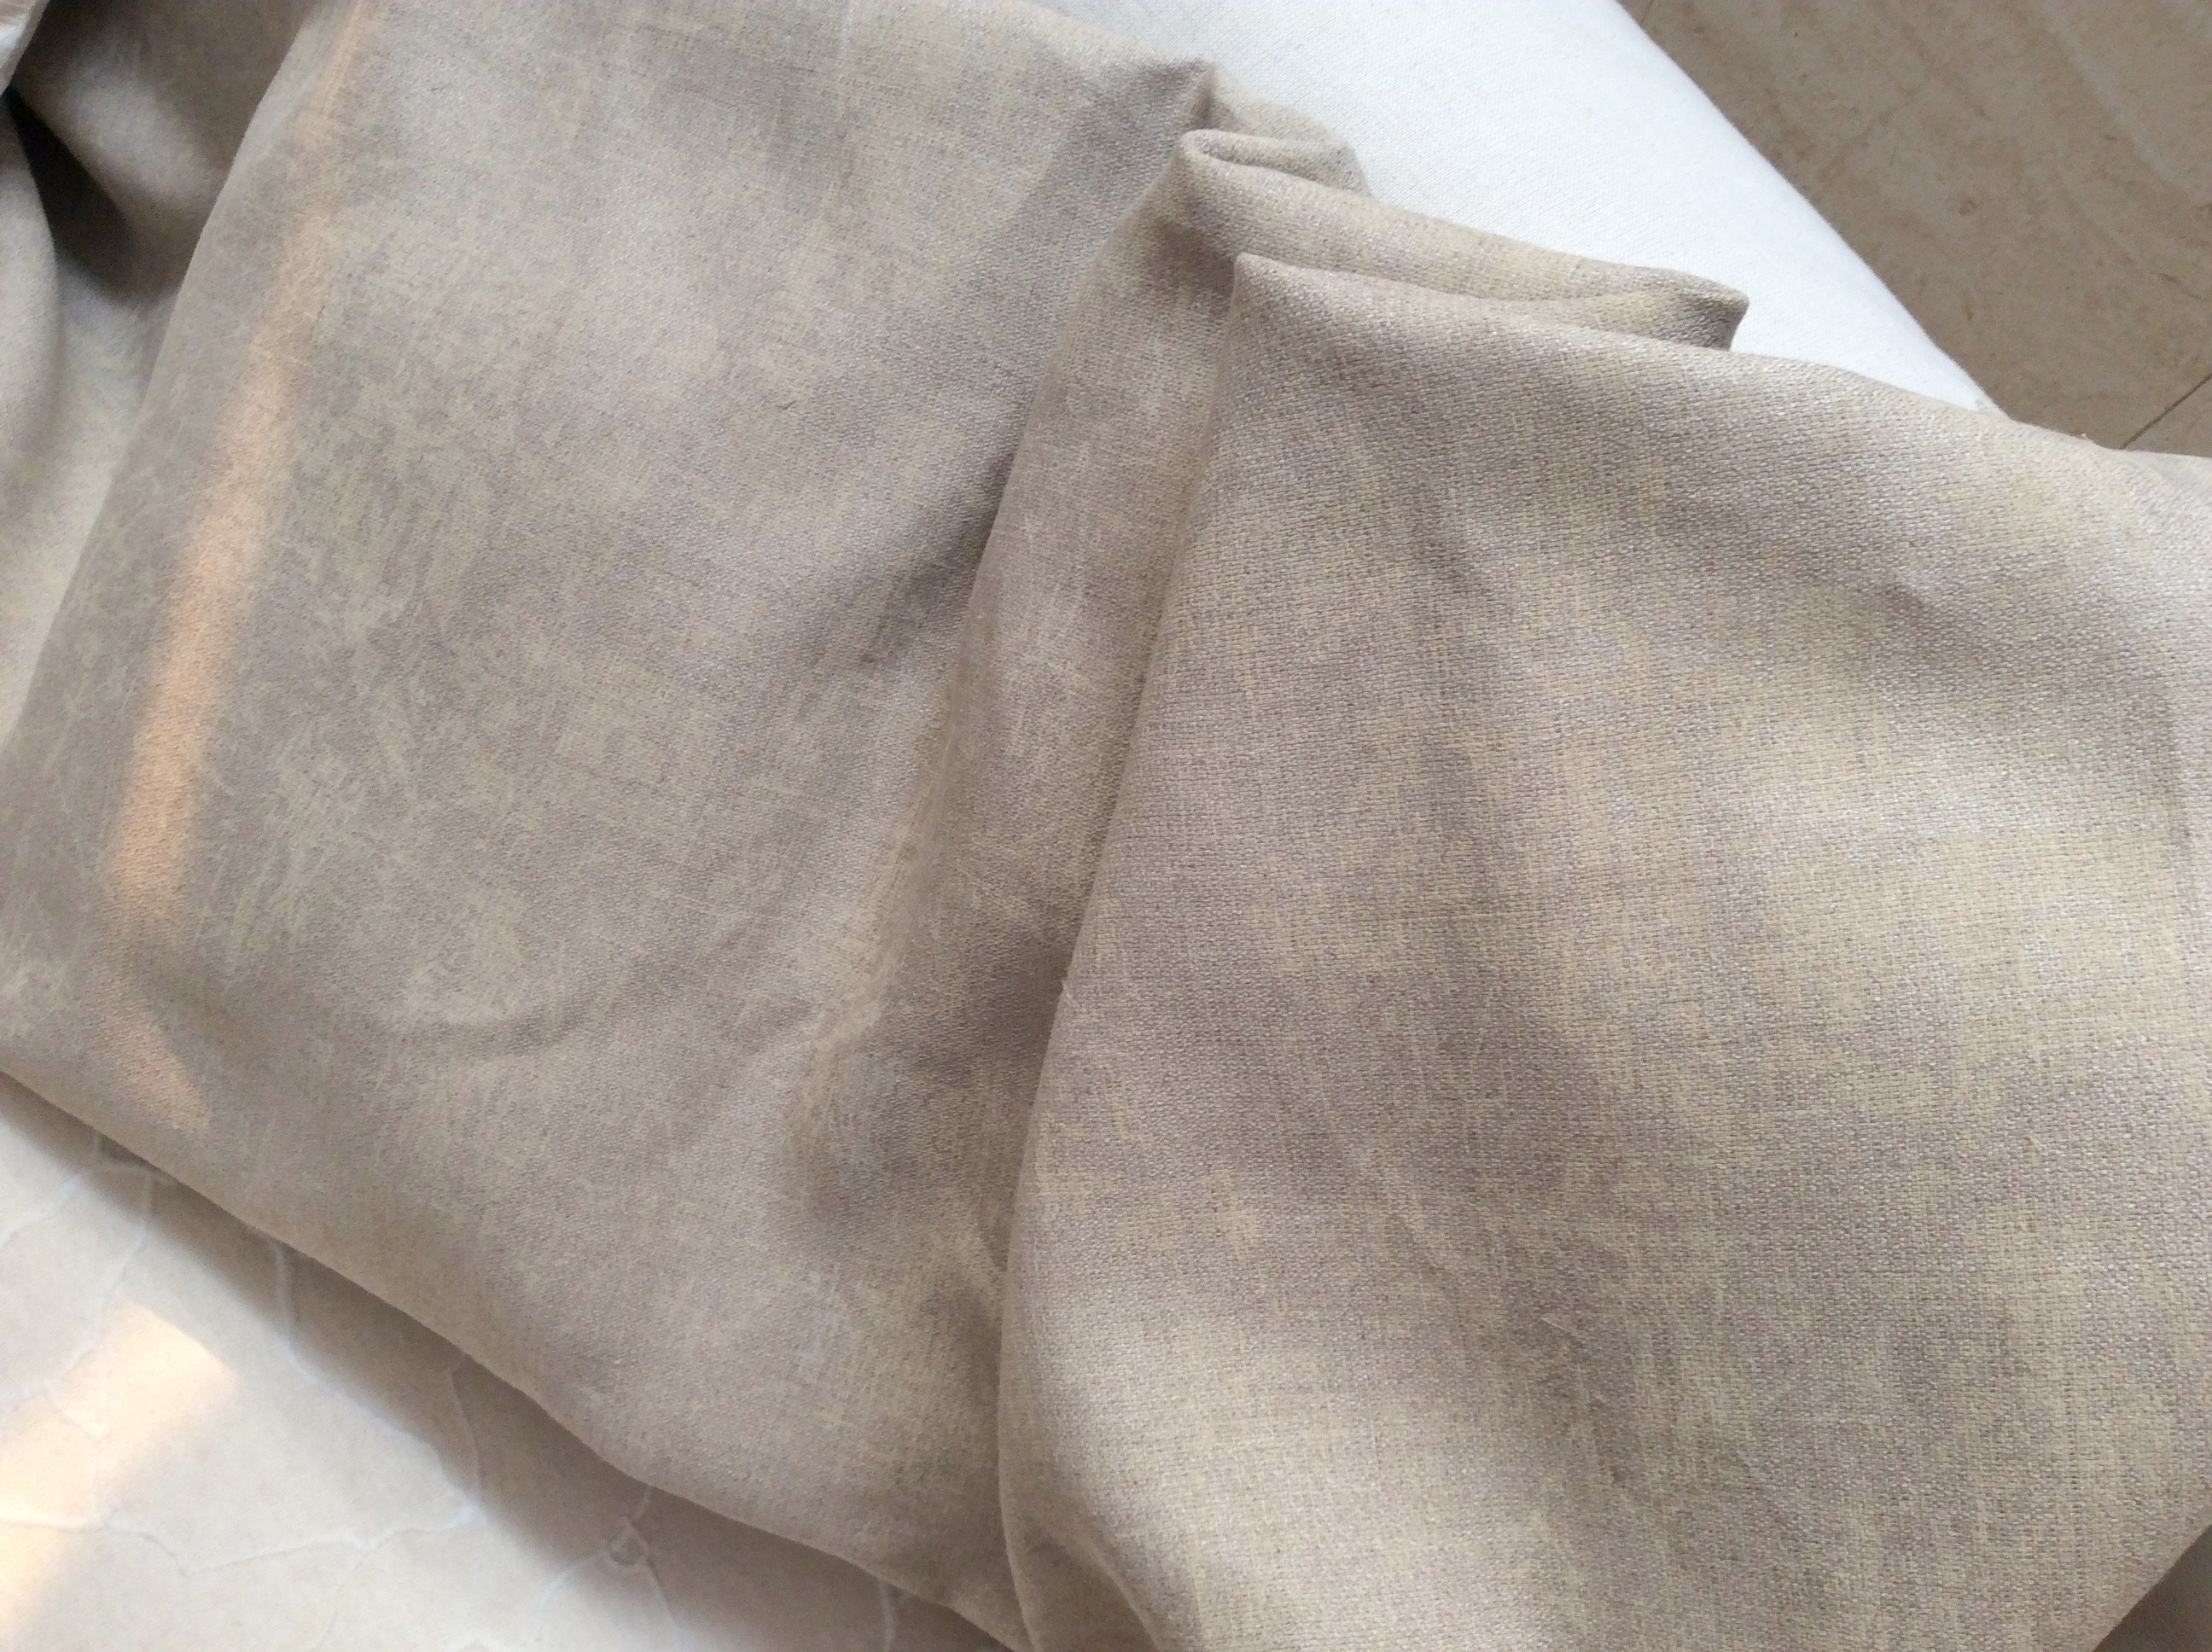 tissu lin beige avec dessin